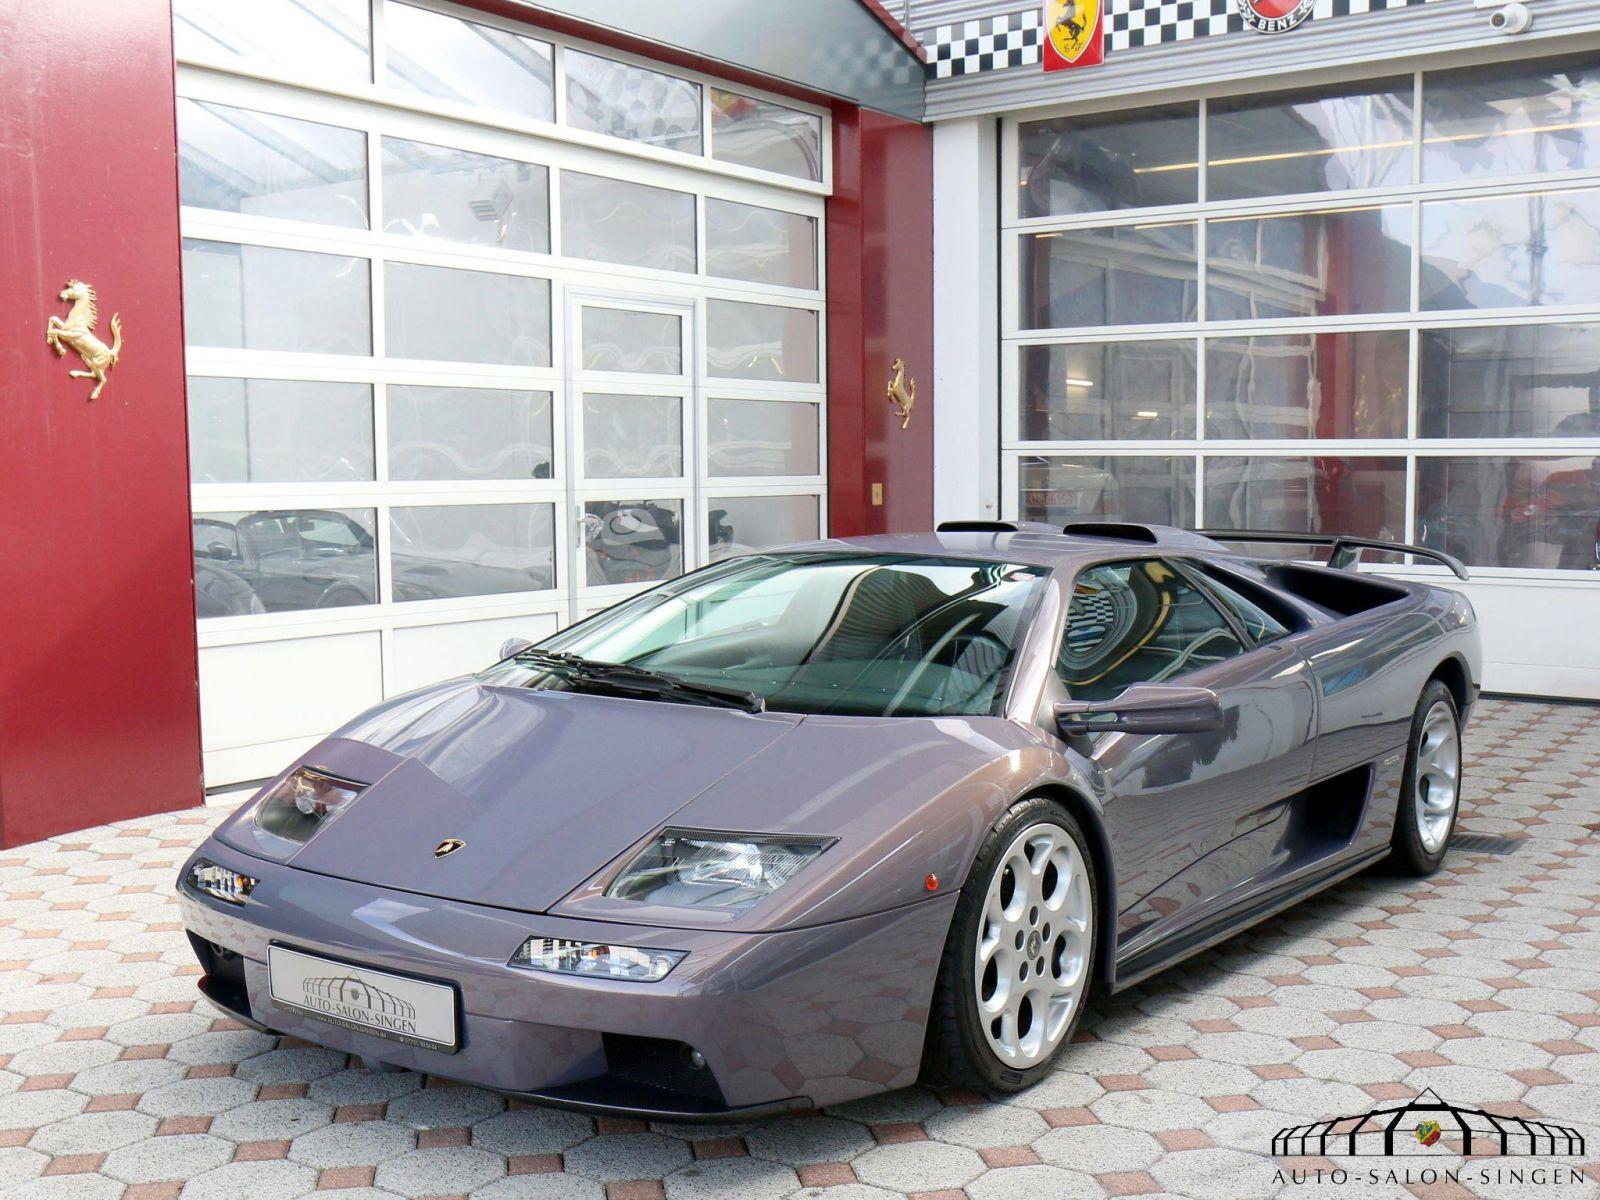 Lamborghini Diablo Vt 6 0 Coupe Auto Salon Singen